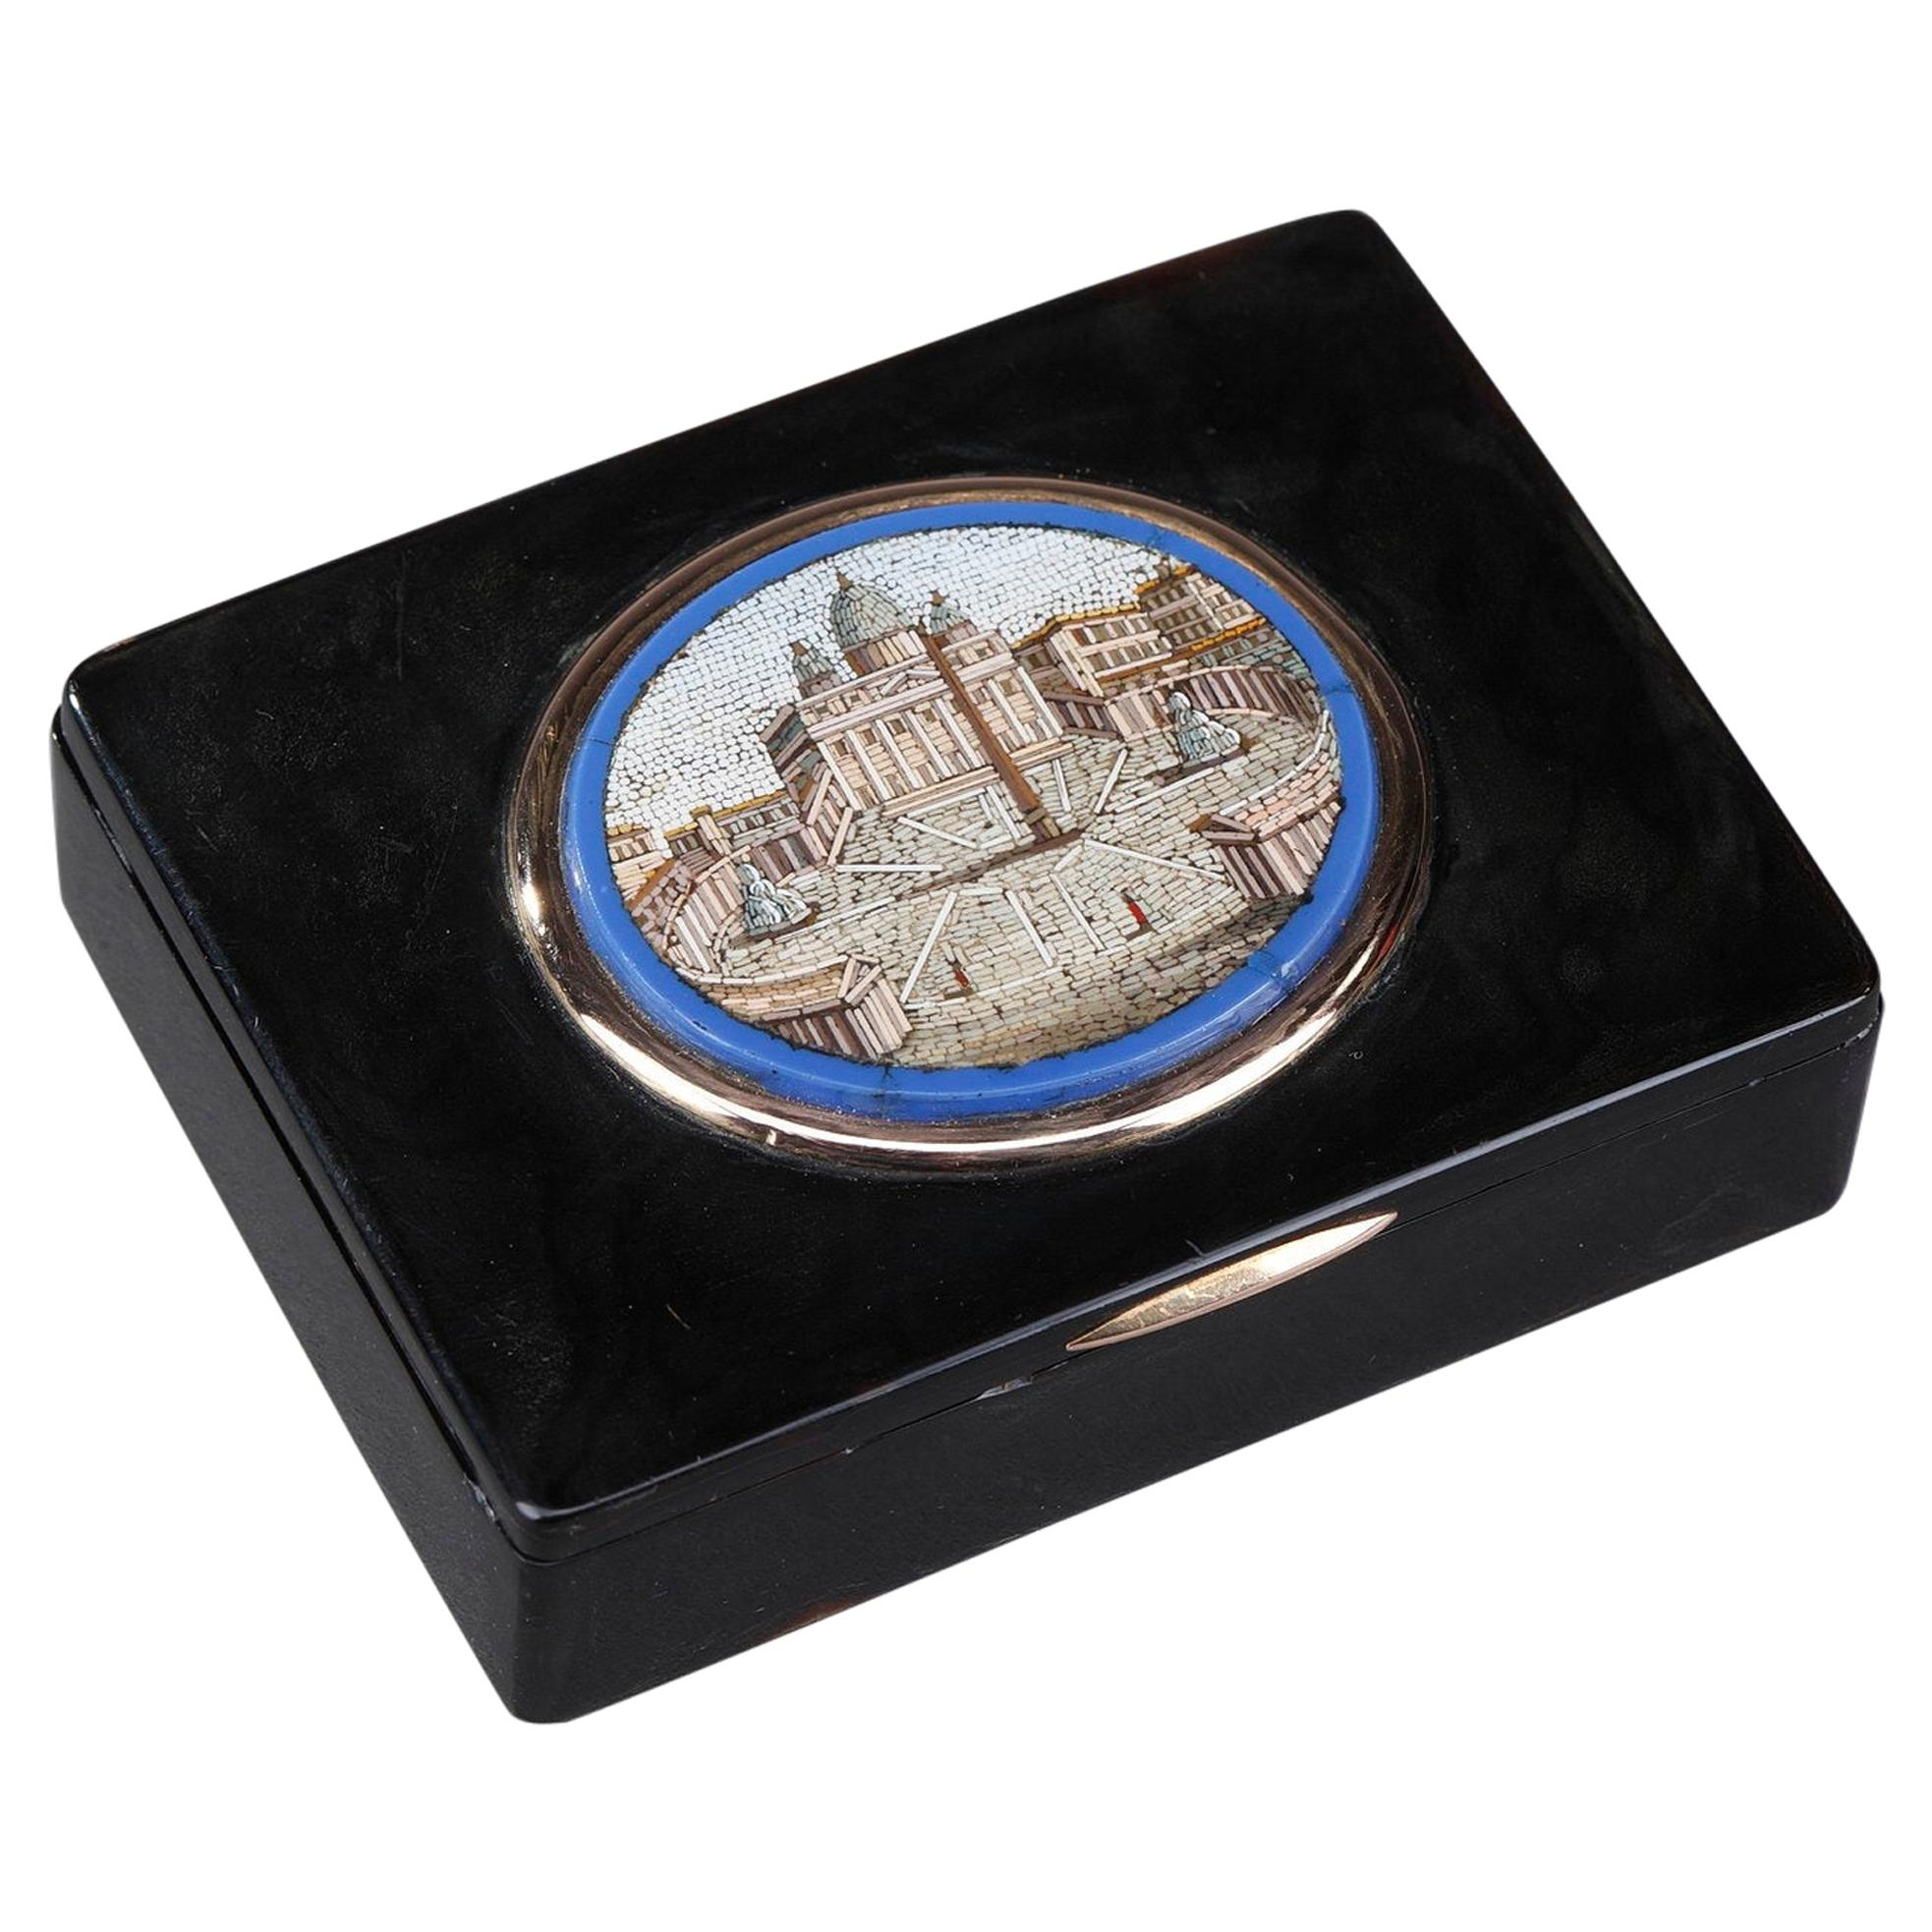 19th Century Restauration Snuff Box with Micromosaic